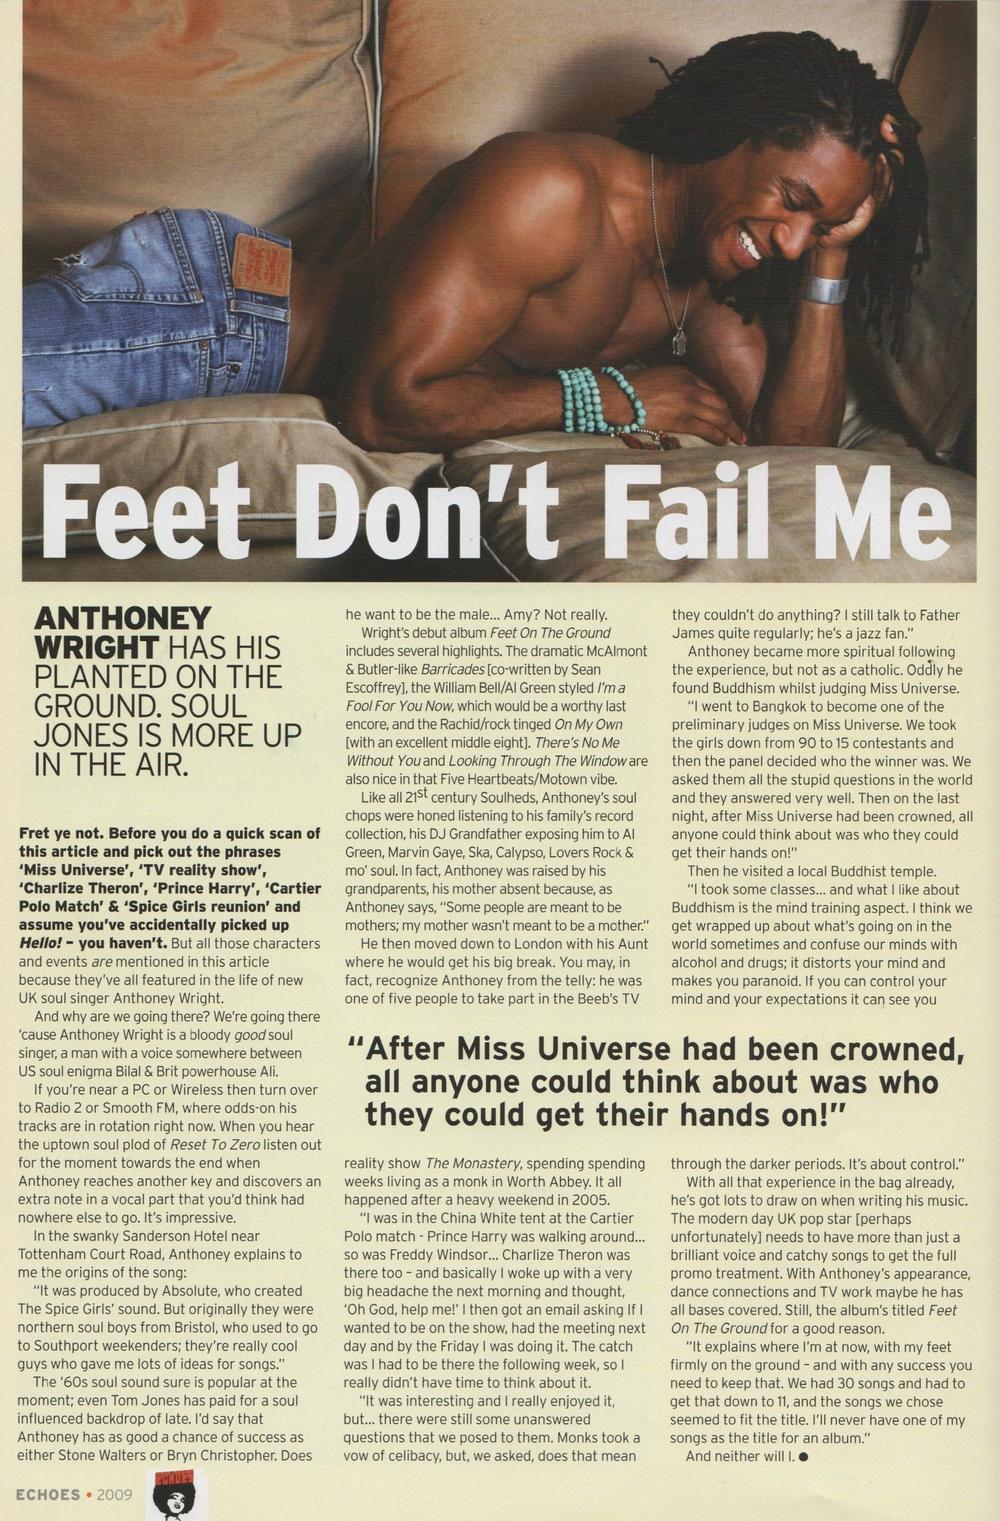 Echoes Magazine Apr 2009